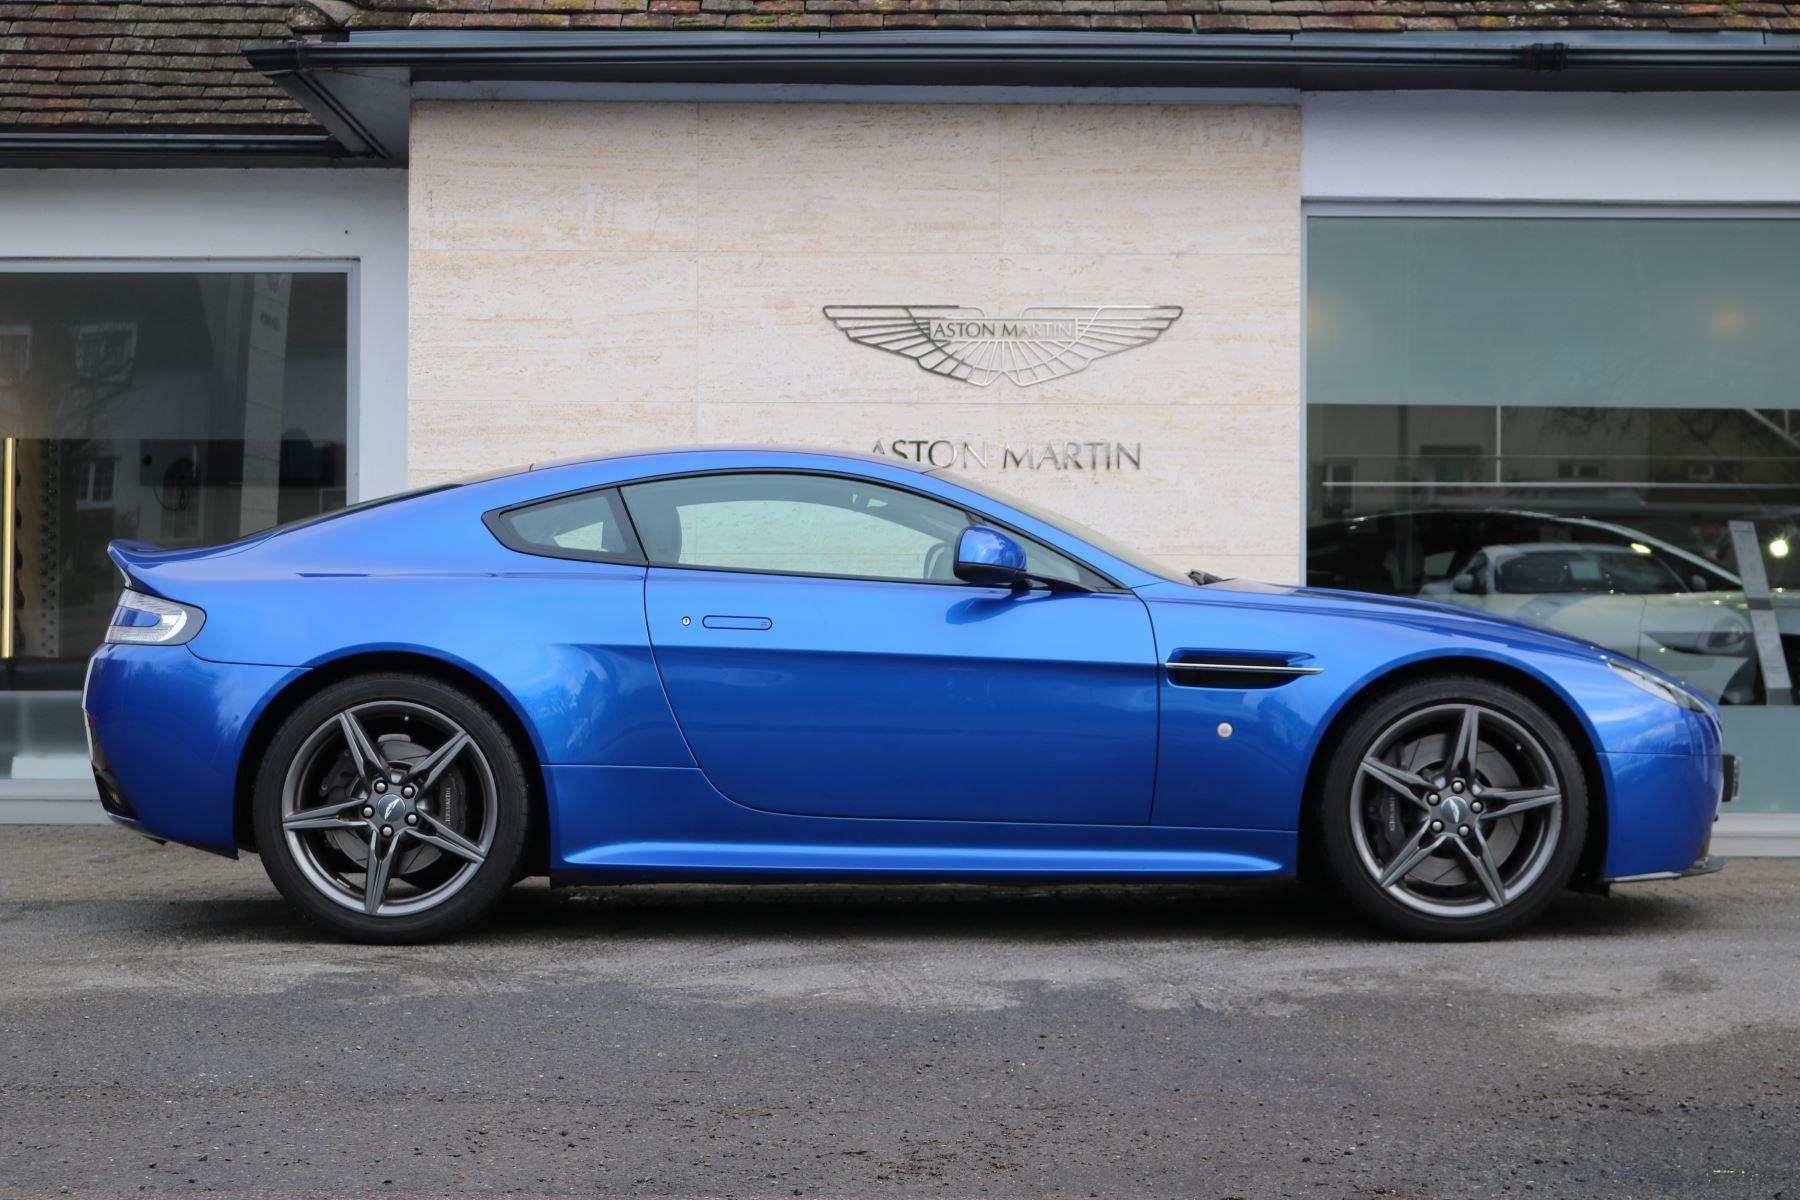 Aston Martin V8 Vantage S S 2dr Sportshift image 4